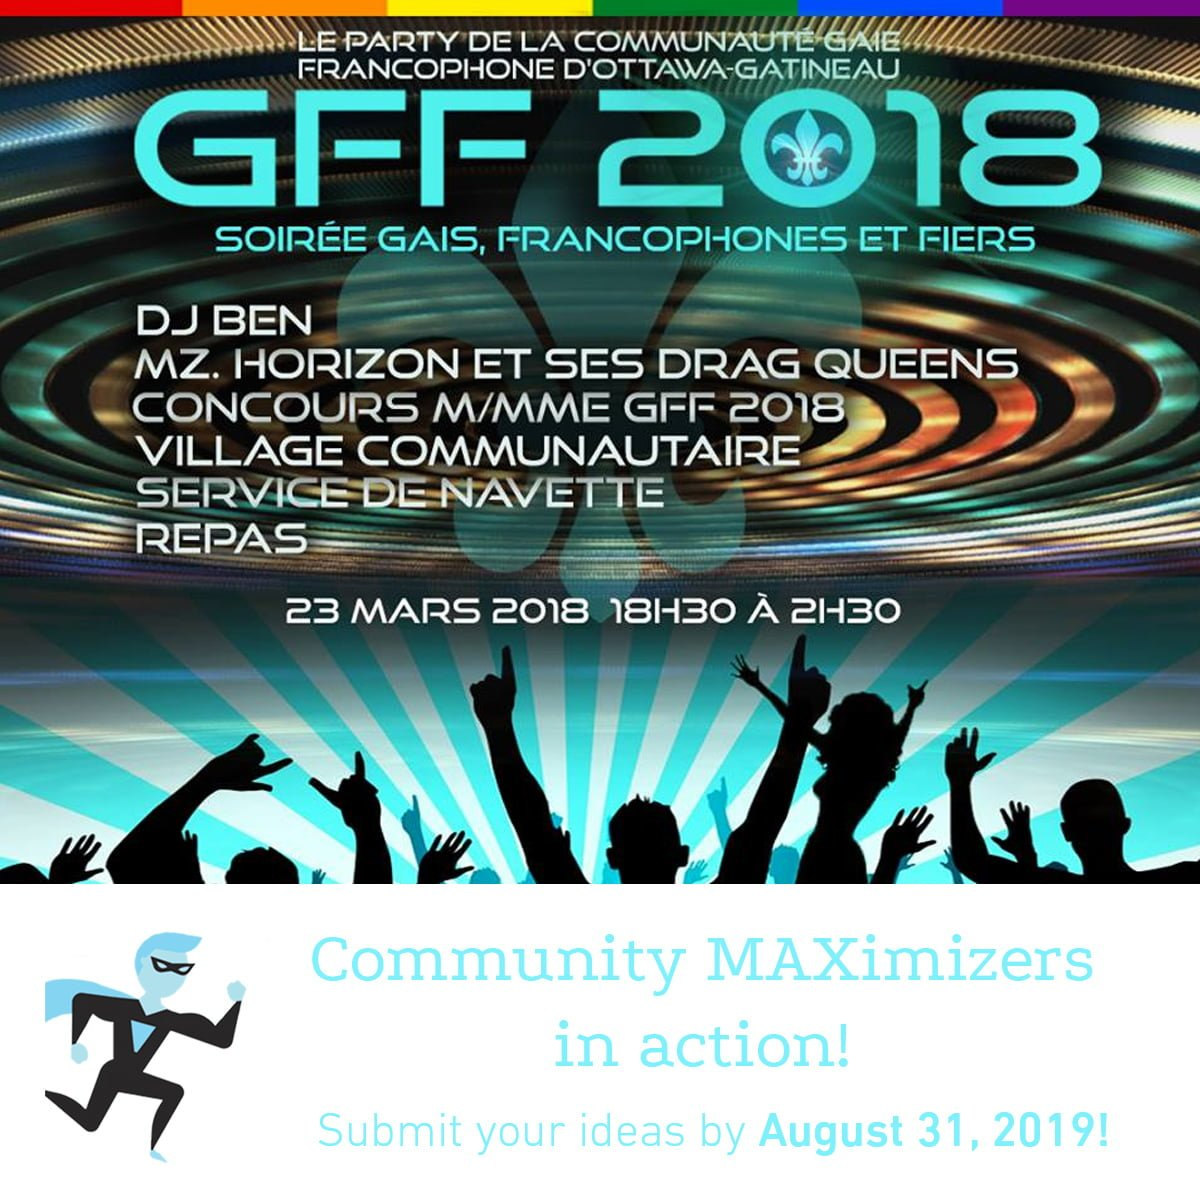 Gaie, Francophones et Fiersposter for Community MAXimizer Program